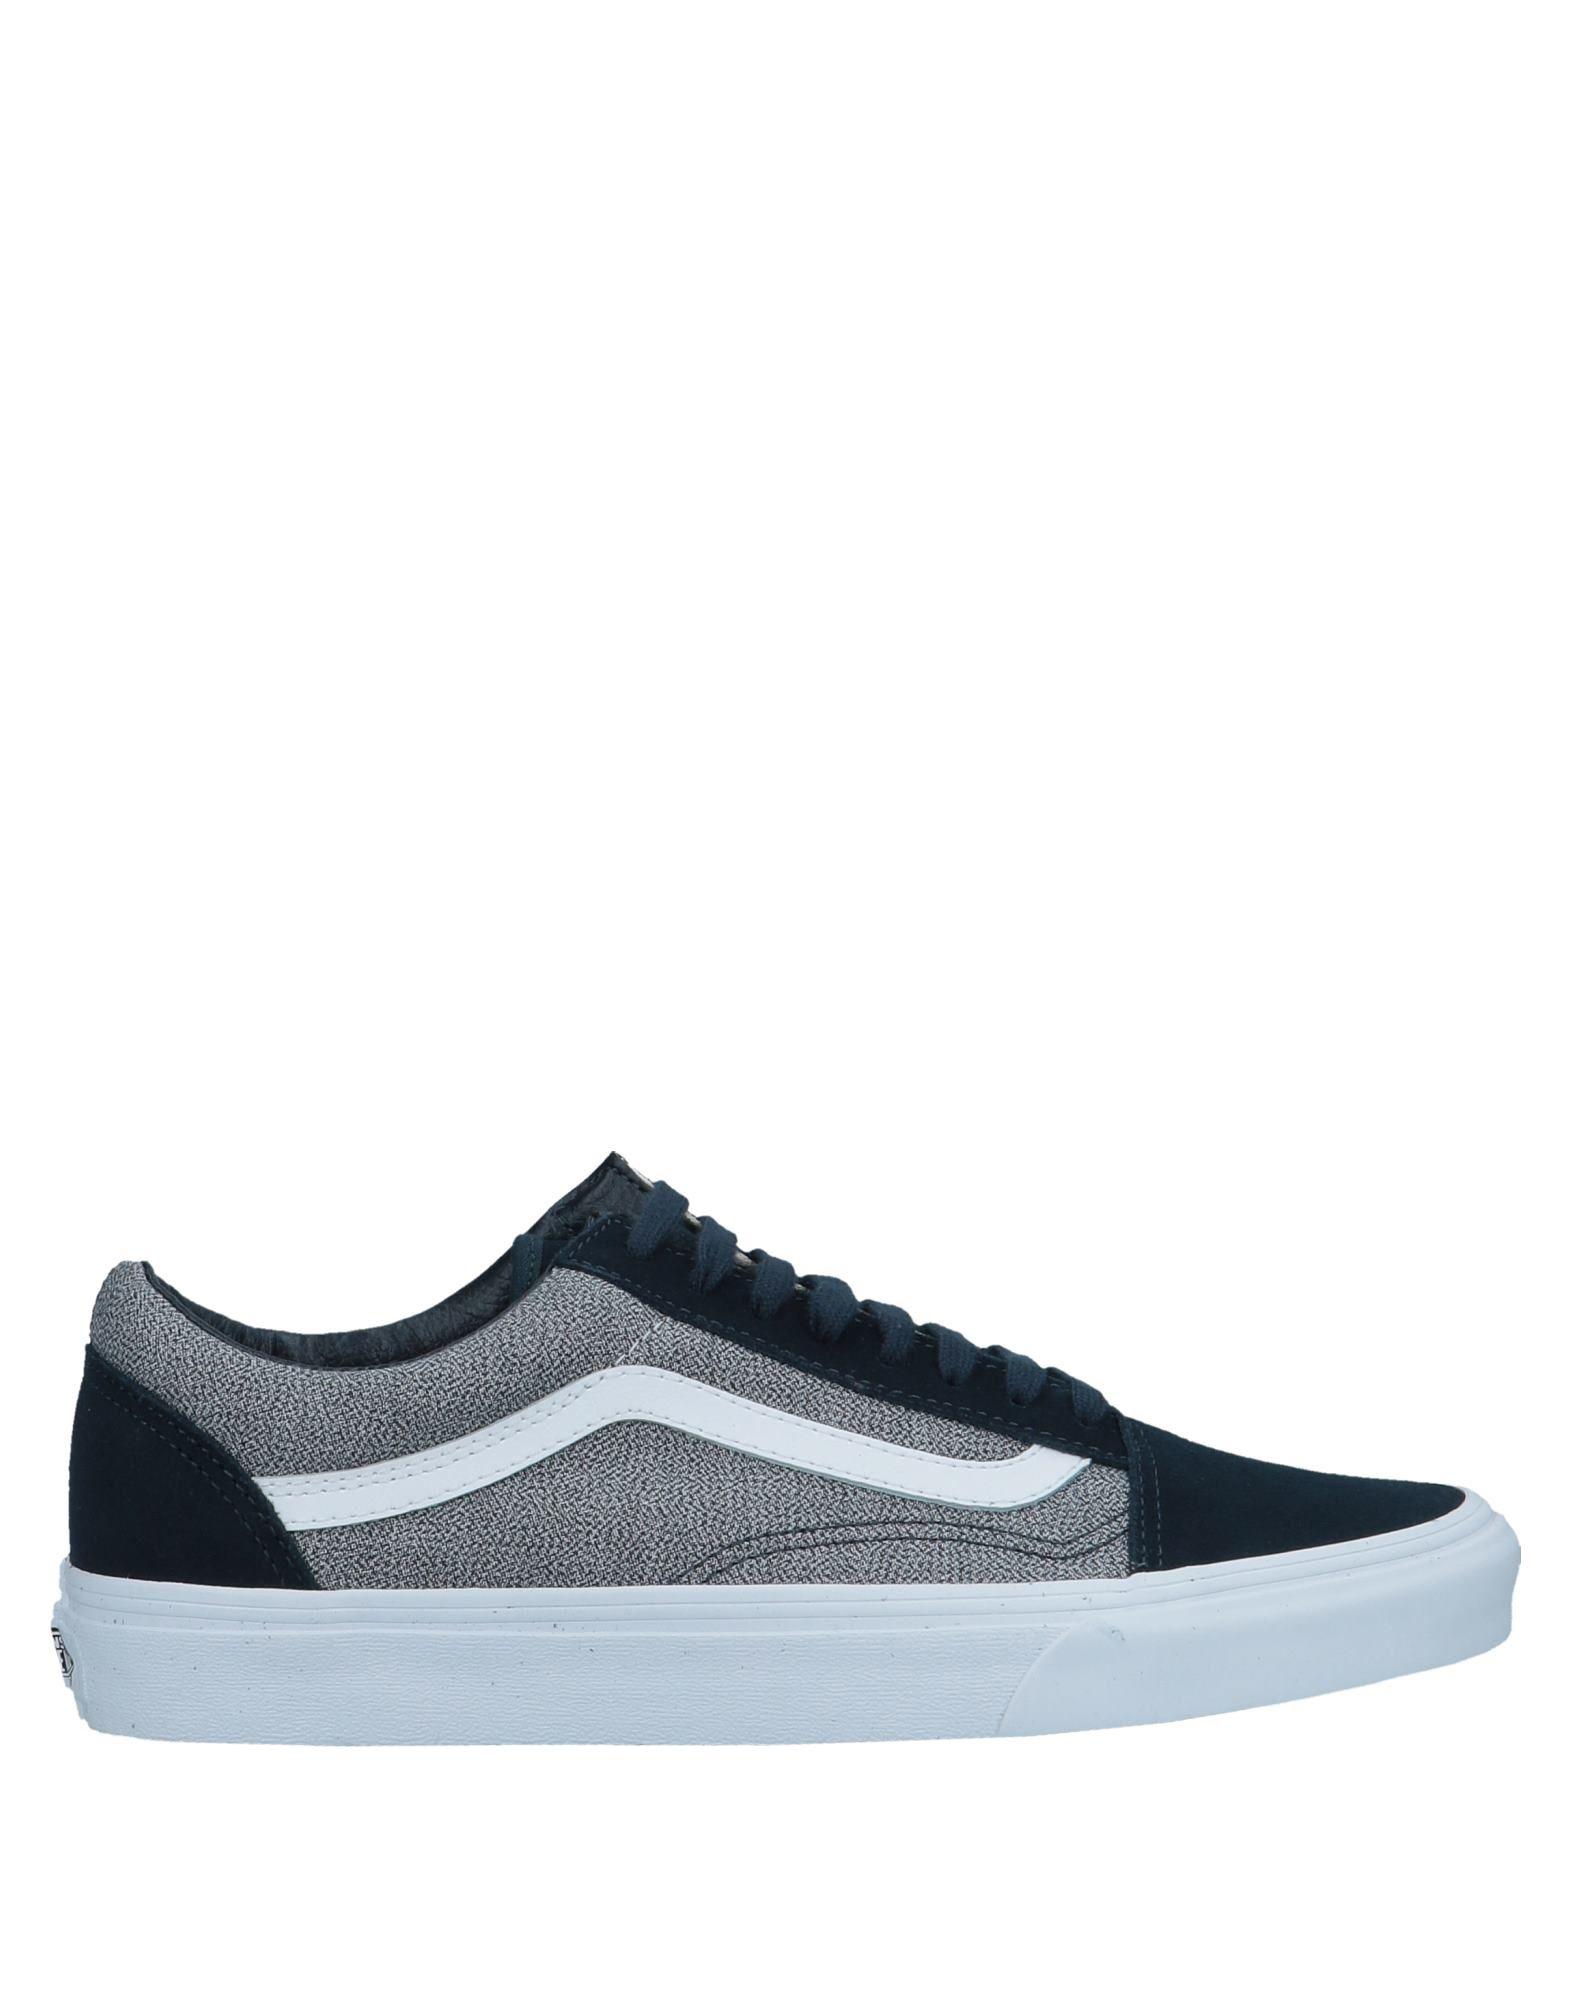 Vans Sneakers - Women Vans Sneakers - online on  Canada - Sneakers 11574033NF 1c28c3